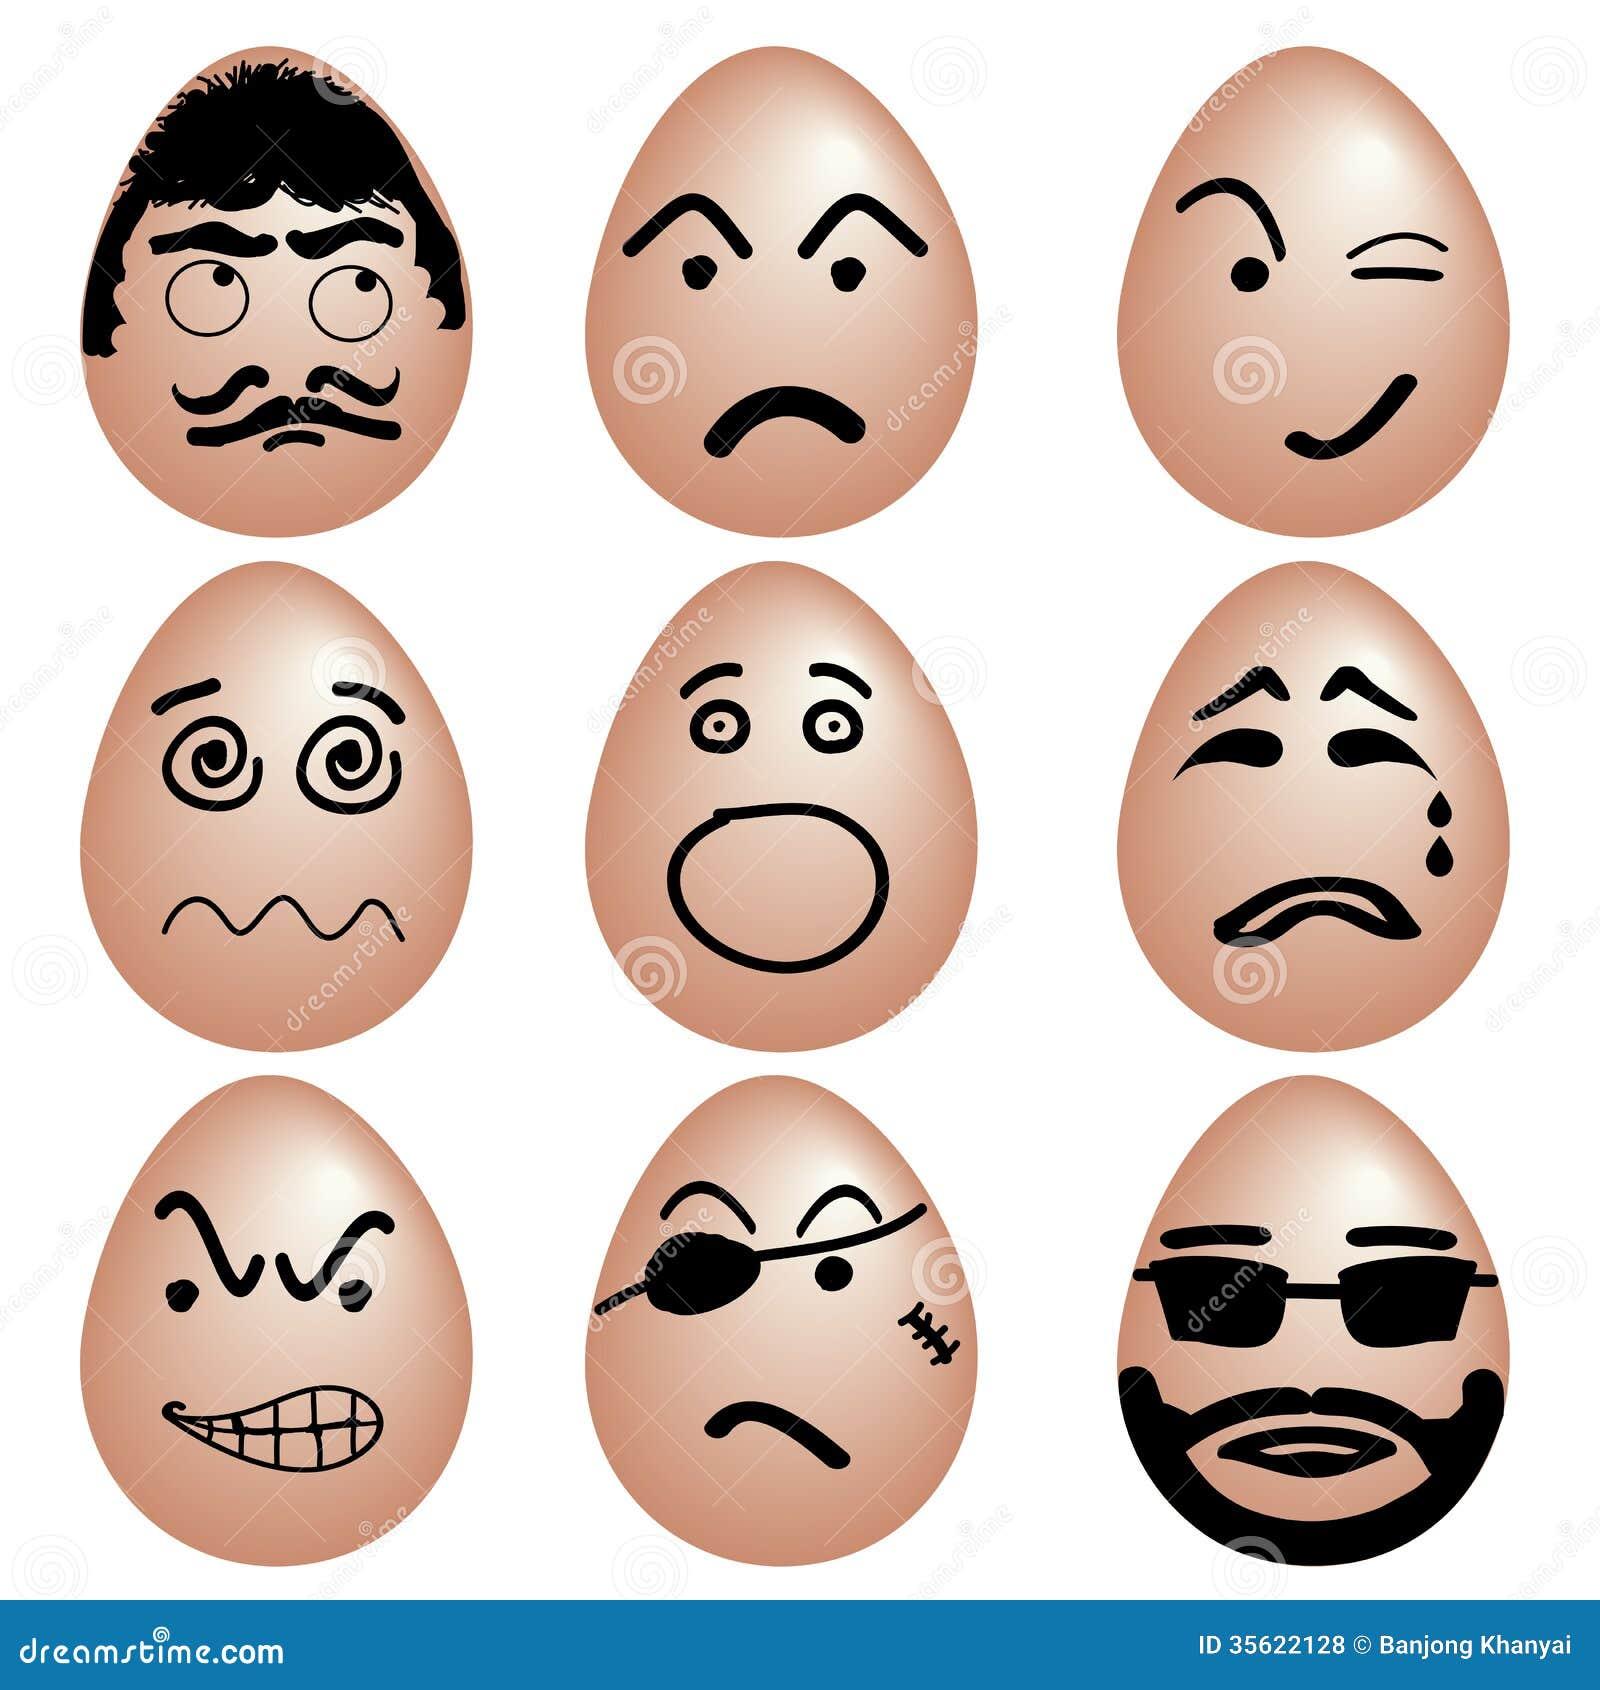 funny eggs emotion mood - photo #7